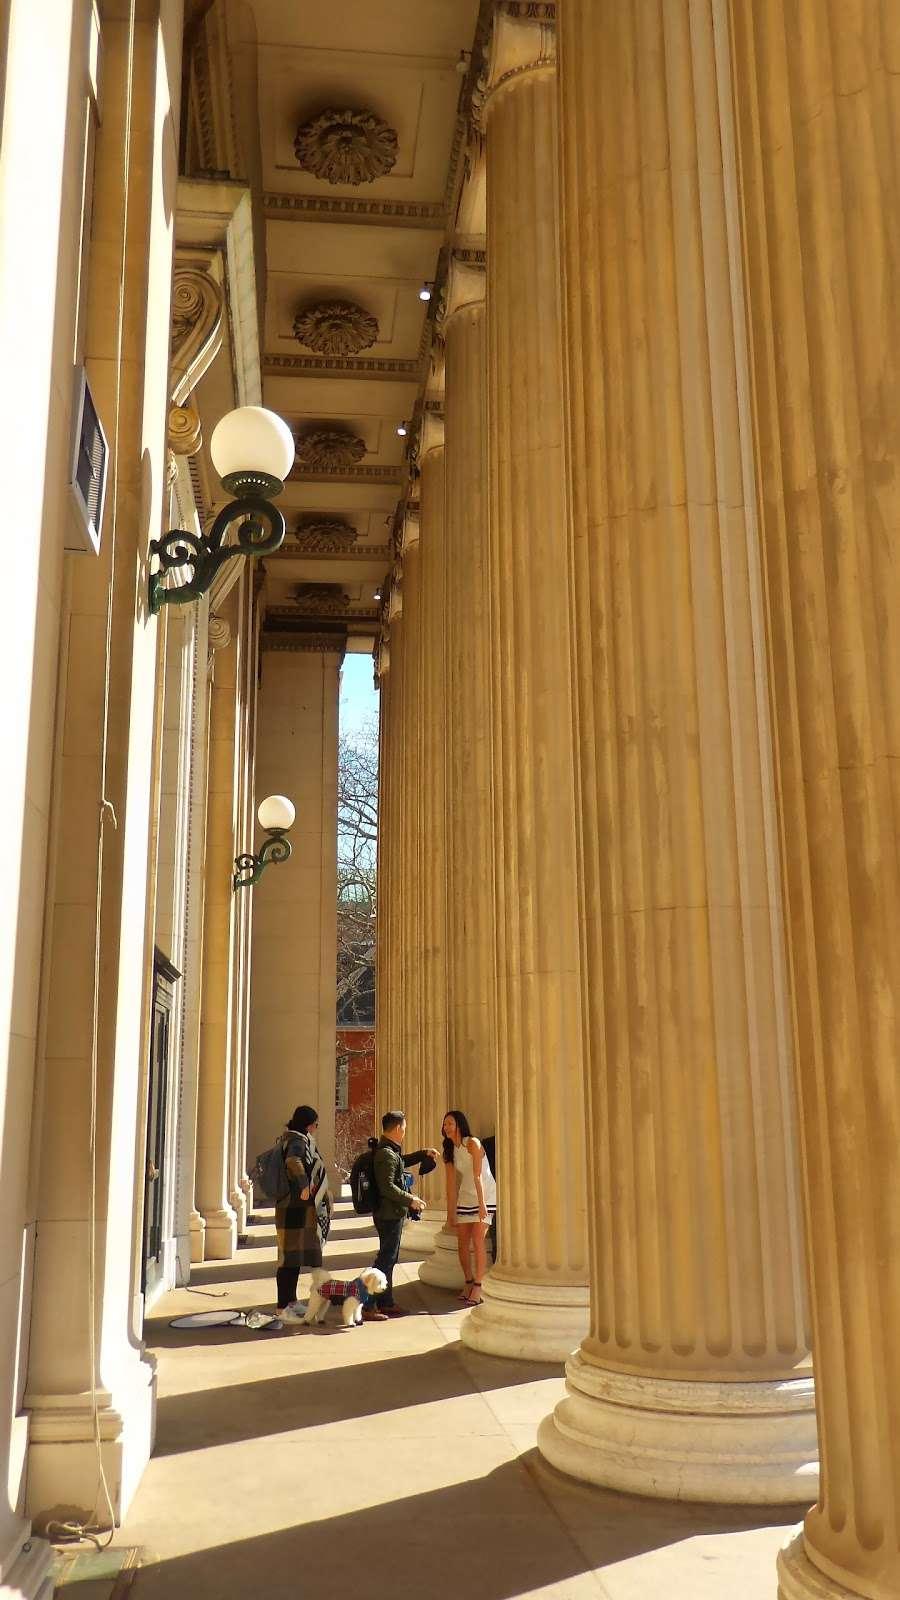 Columbia University - university  | Photo 8 of 10 | Address: 116th St & Broadway, New York, NY 10027, USA | Phone: (212) 854-1754